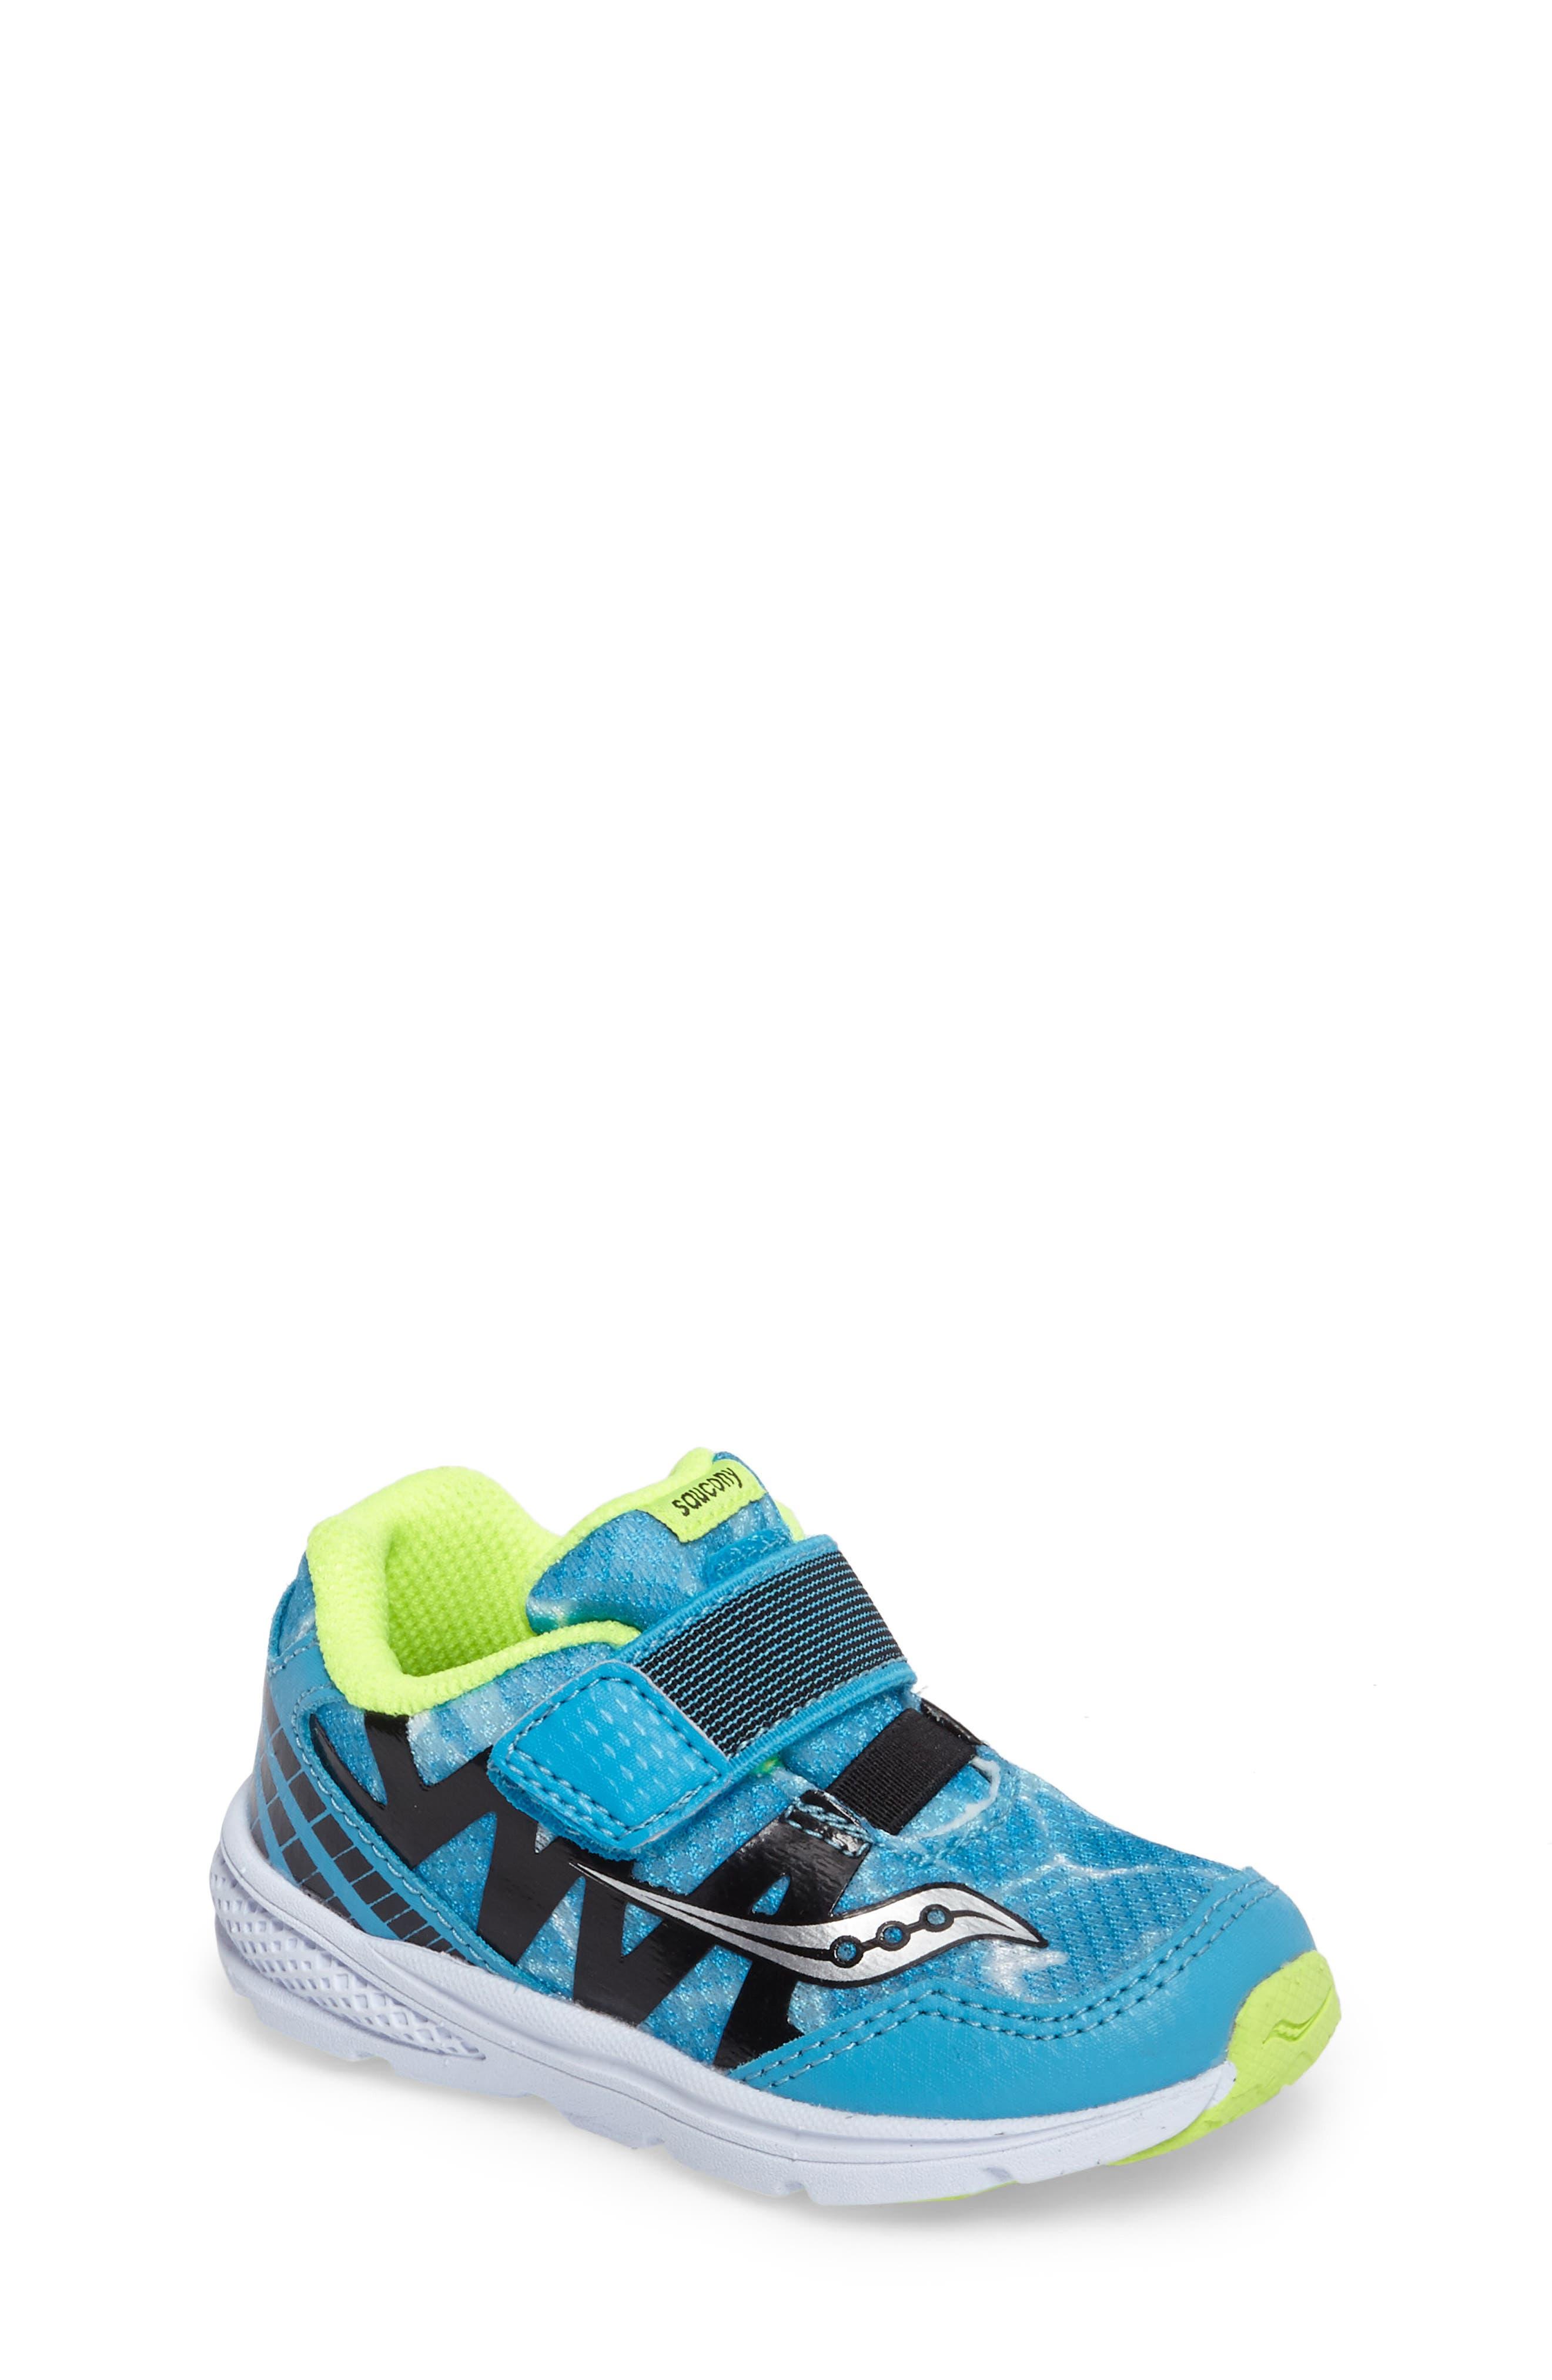 Baby Ride Pro Sneaker,                             Main thumbnail 1, color,                             400